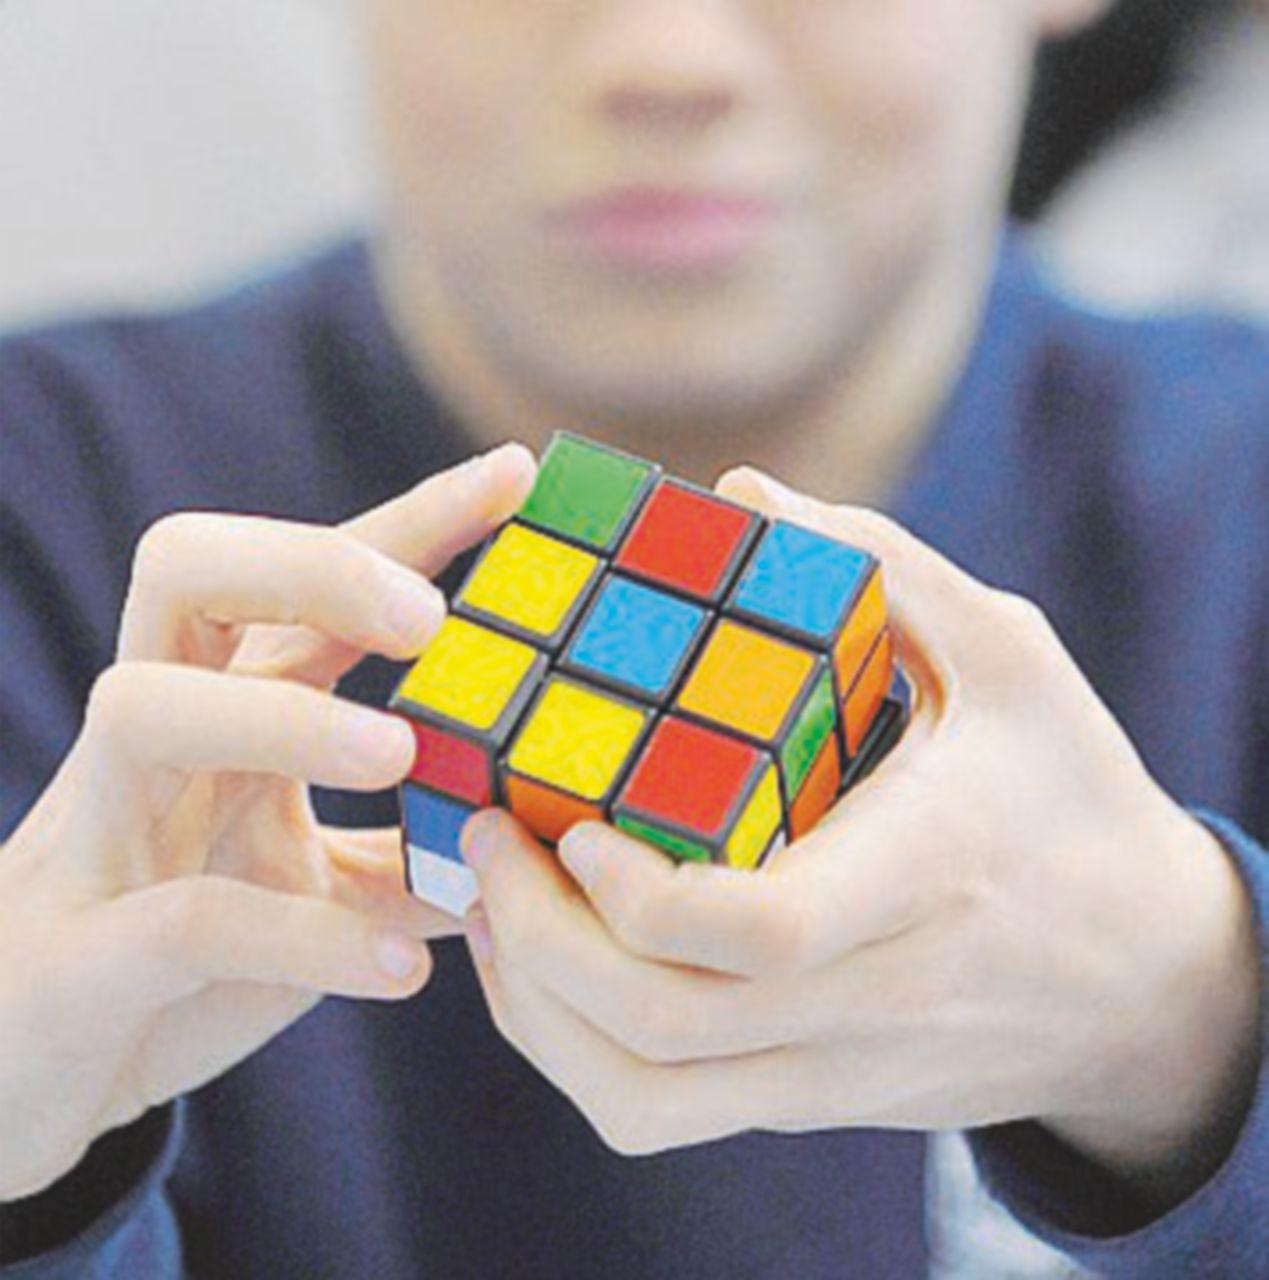 È ungherese il rompicapo al cubo (di Rubik)